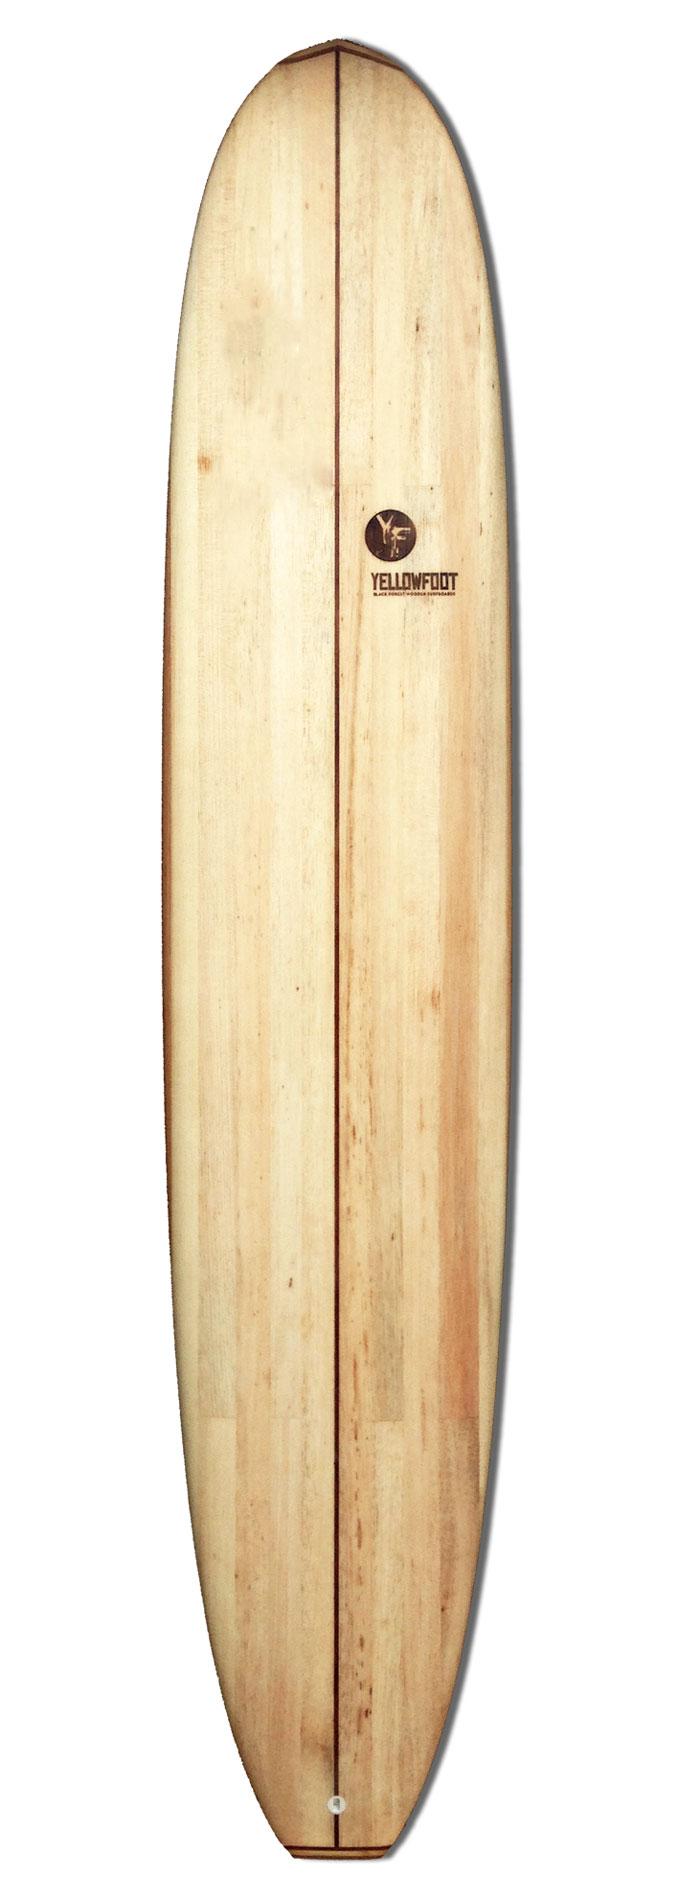 Longboard-aus-Holz